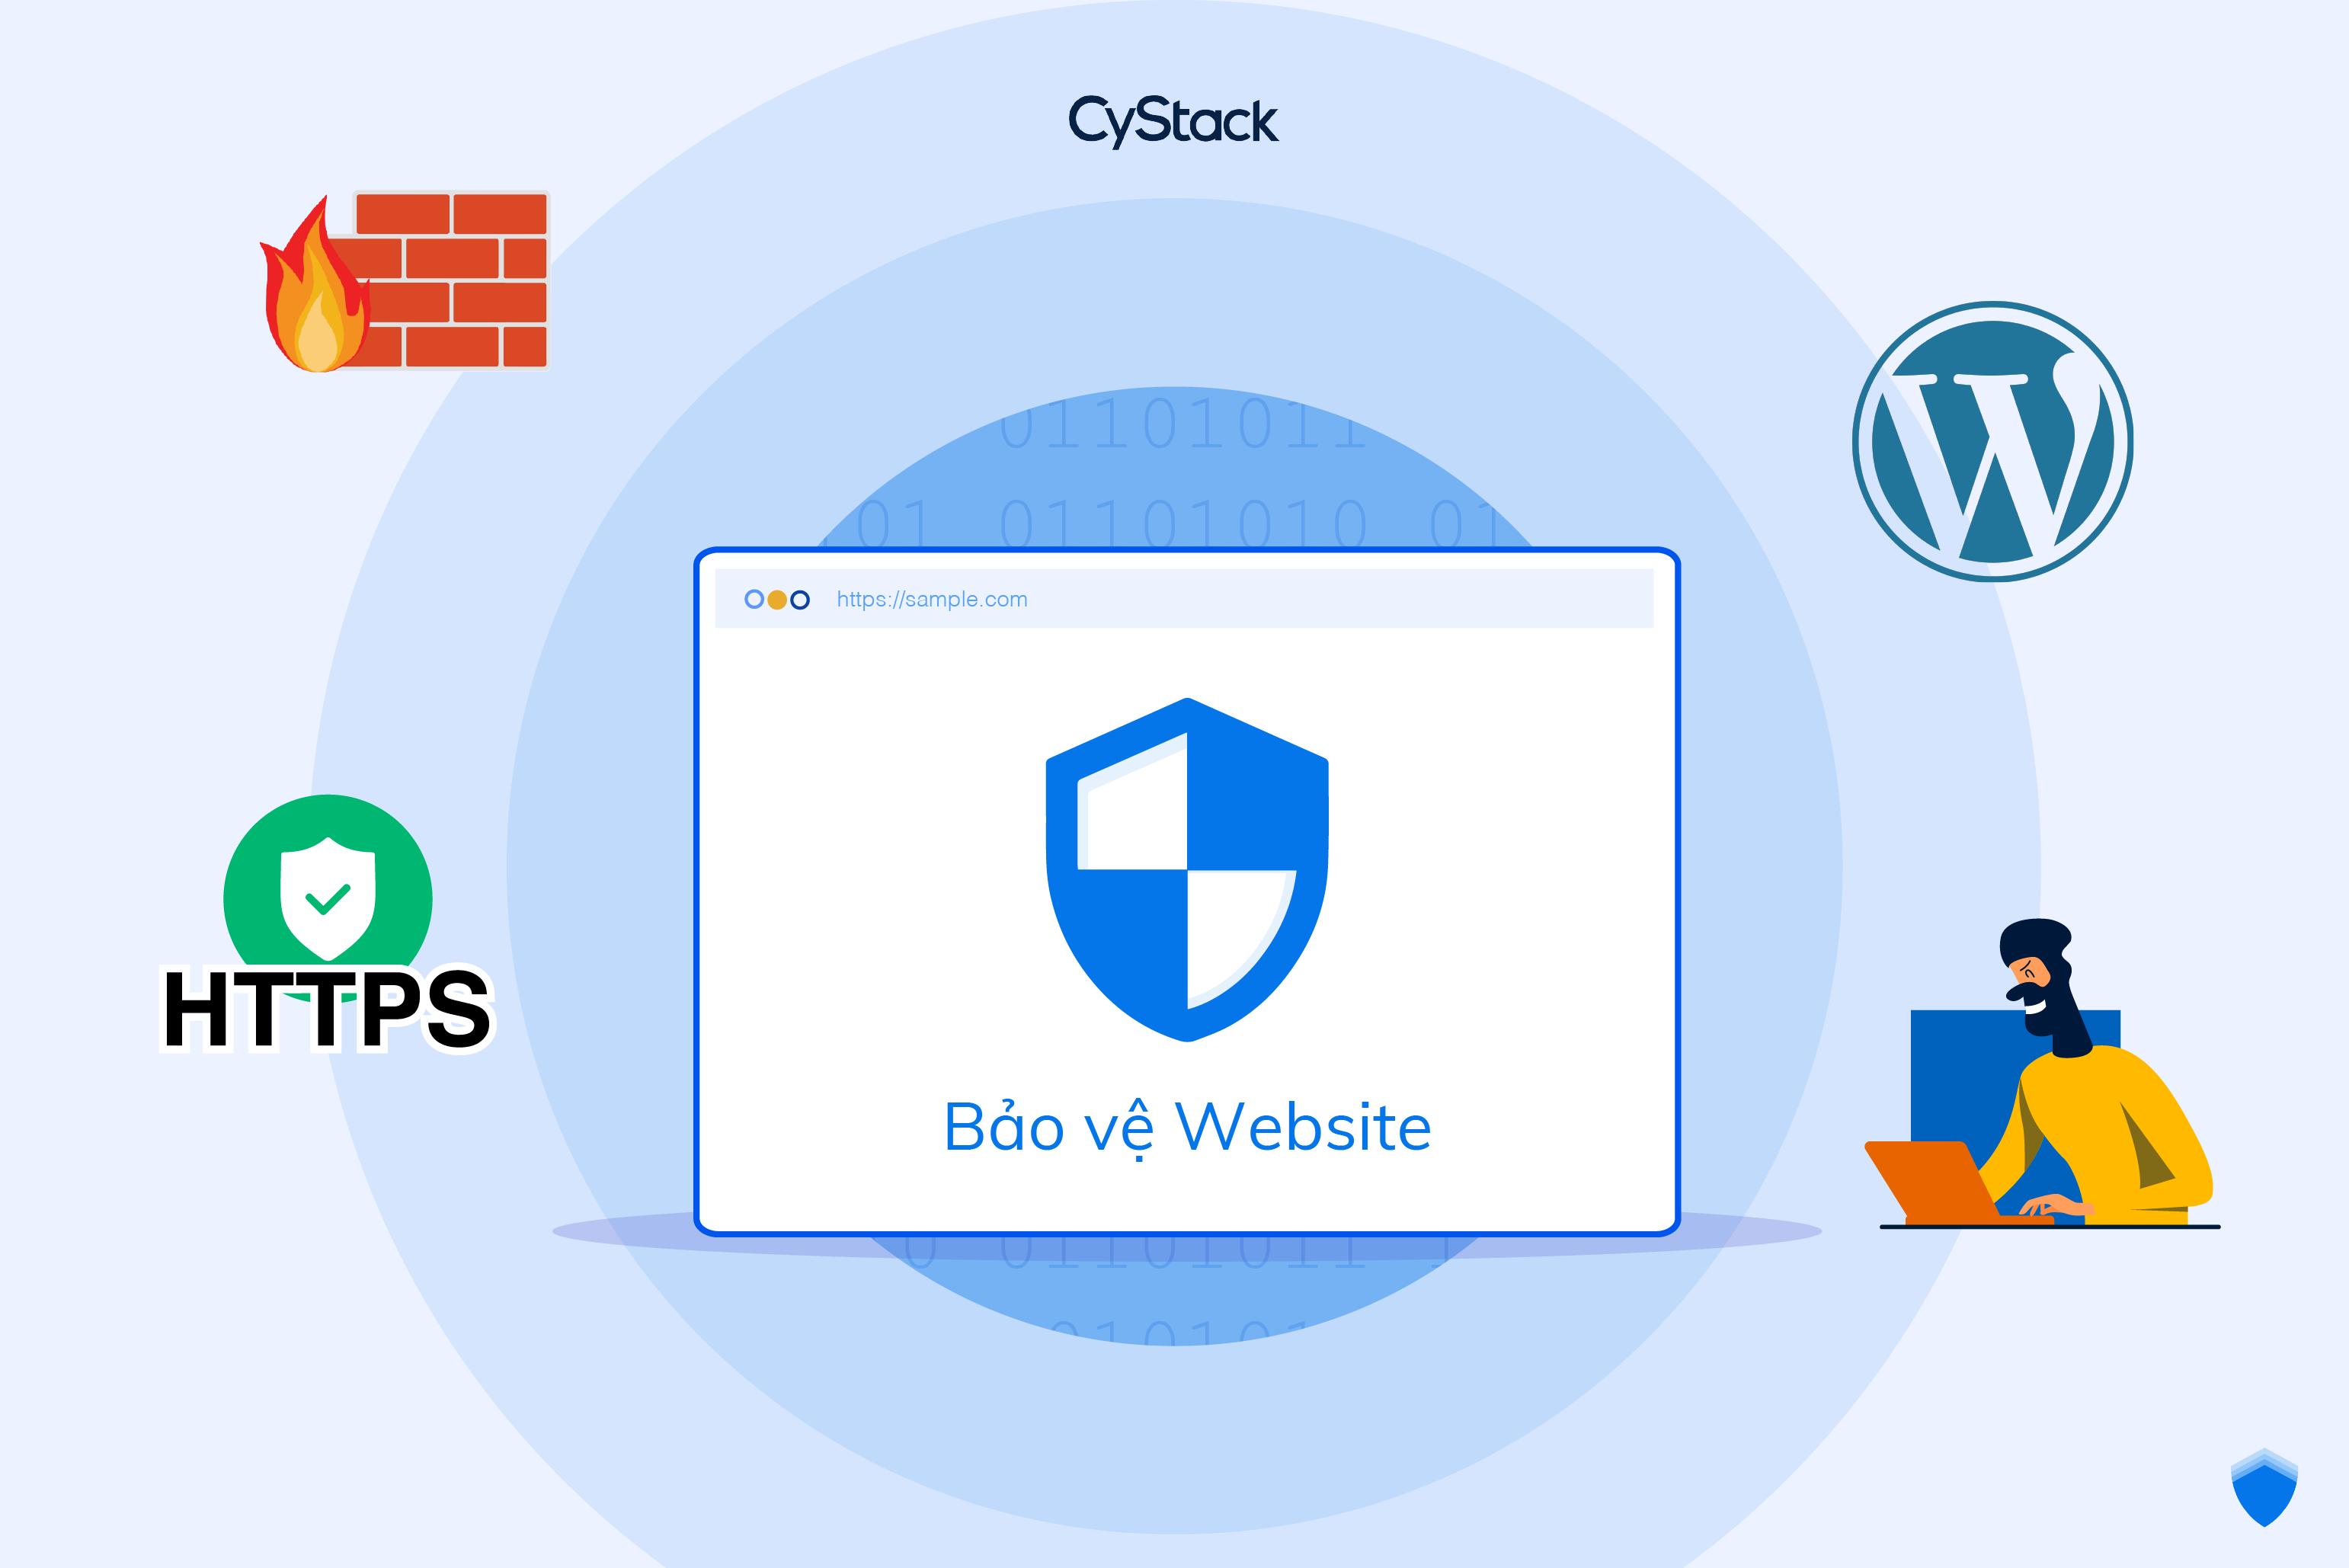 bảo vệ website toàn diện